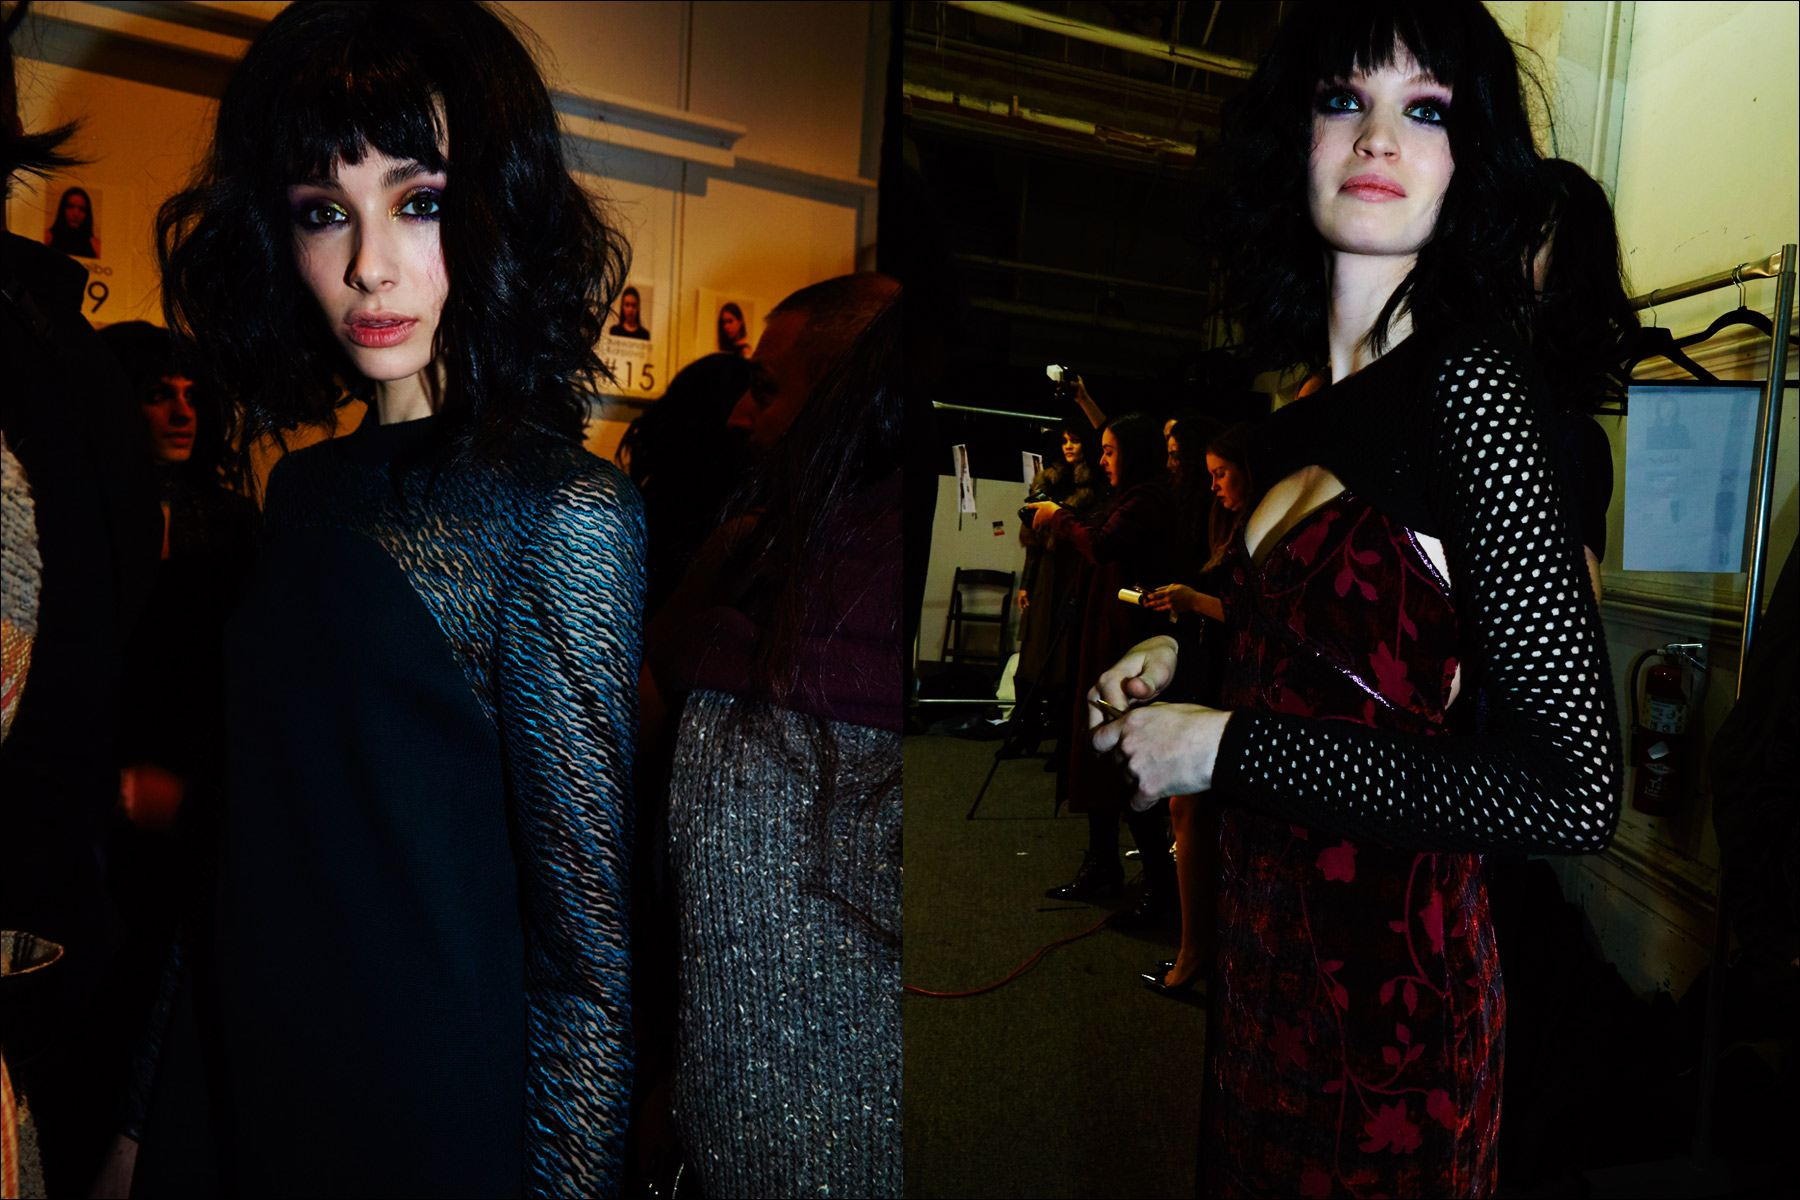 Models Iliana Ruiz & Luisa Bianchin backstage at the Georgine F/W17 womenswear show. Photography by Alexander Thompson for Ponyboy magazine.